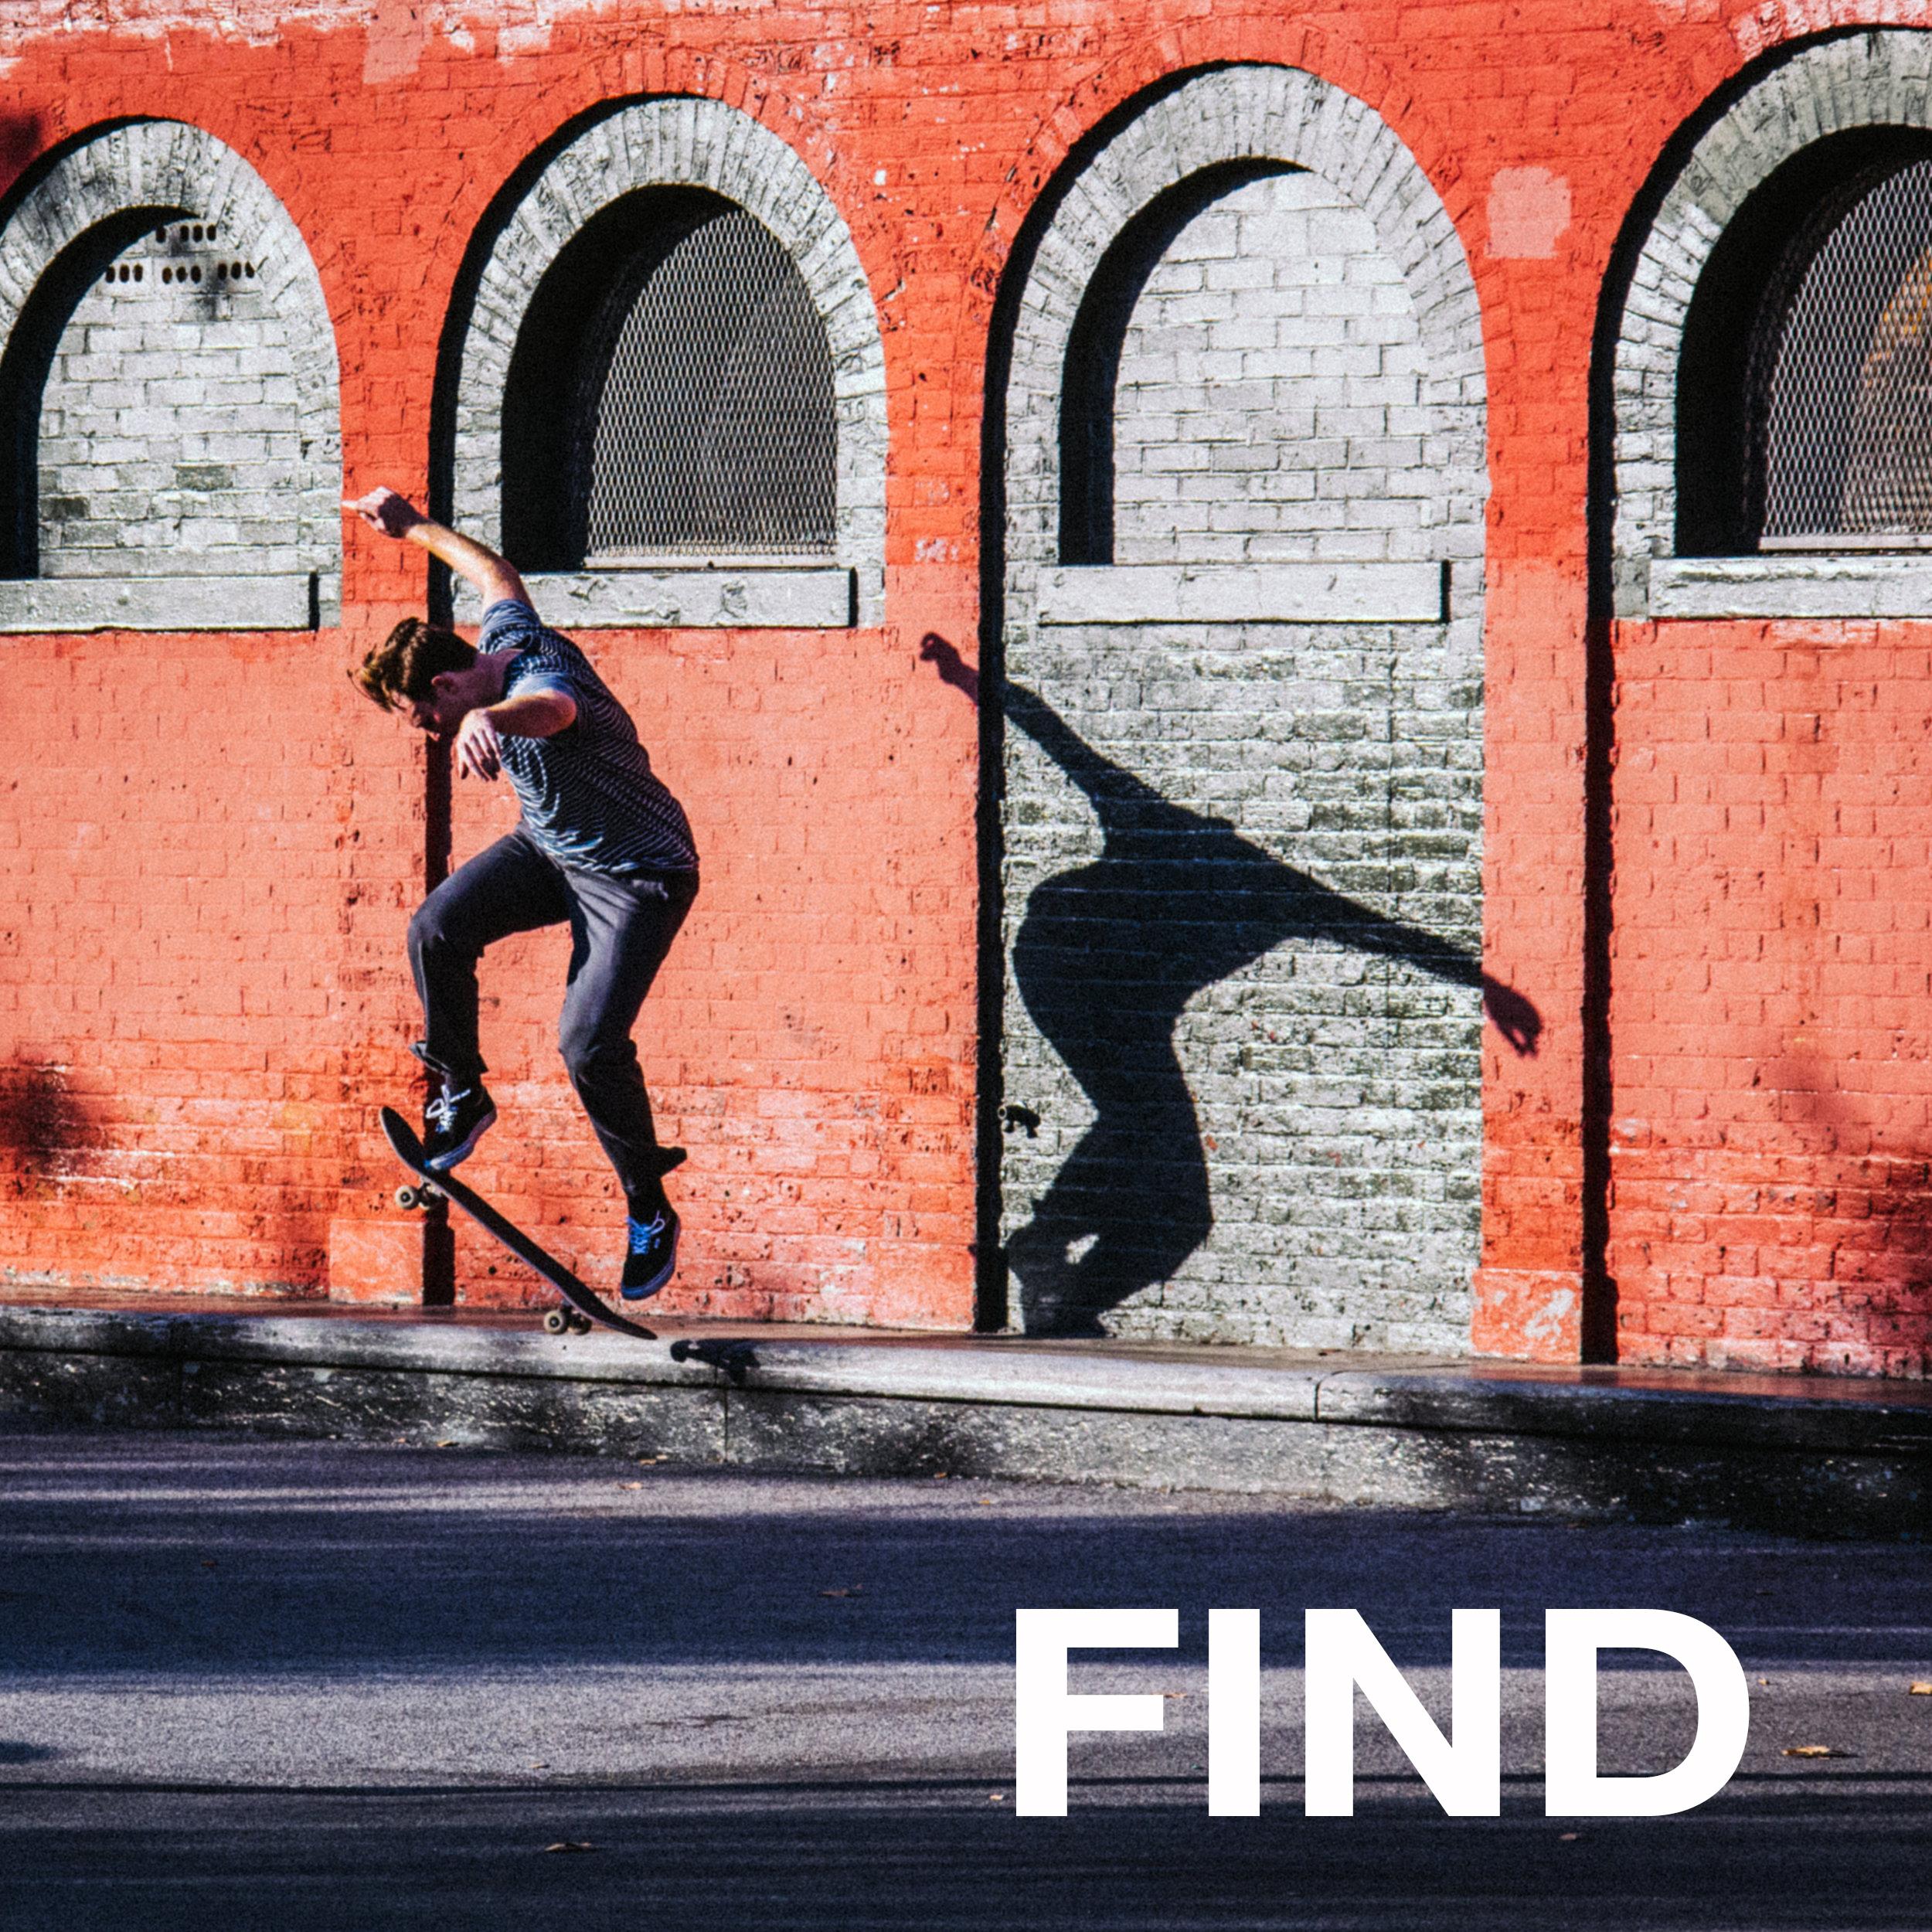 skate_find_orange.jpg